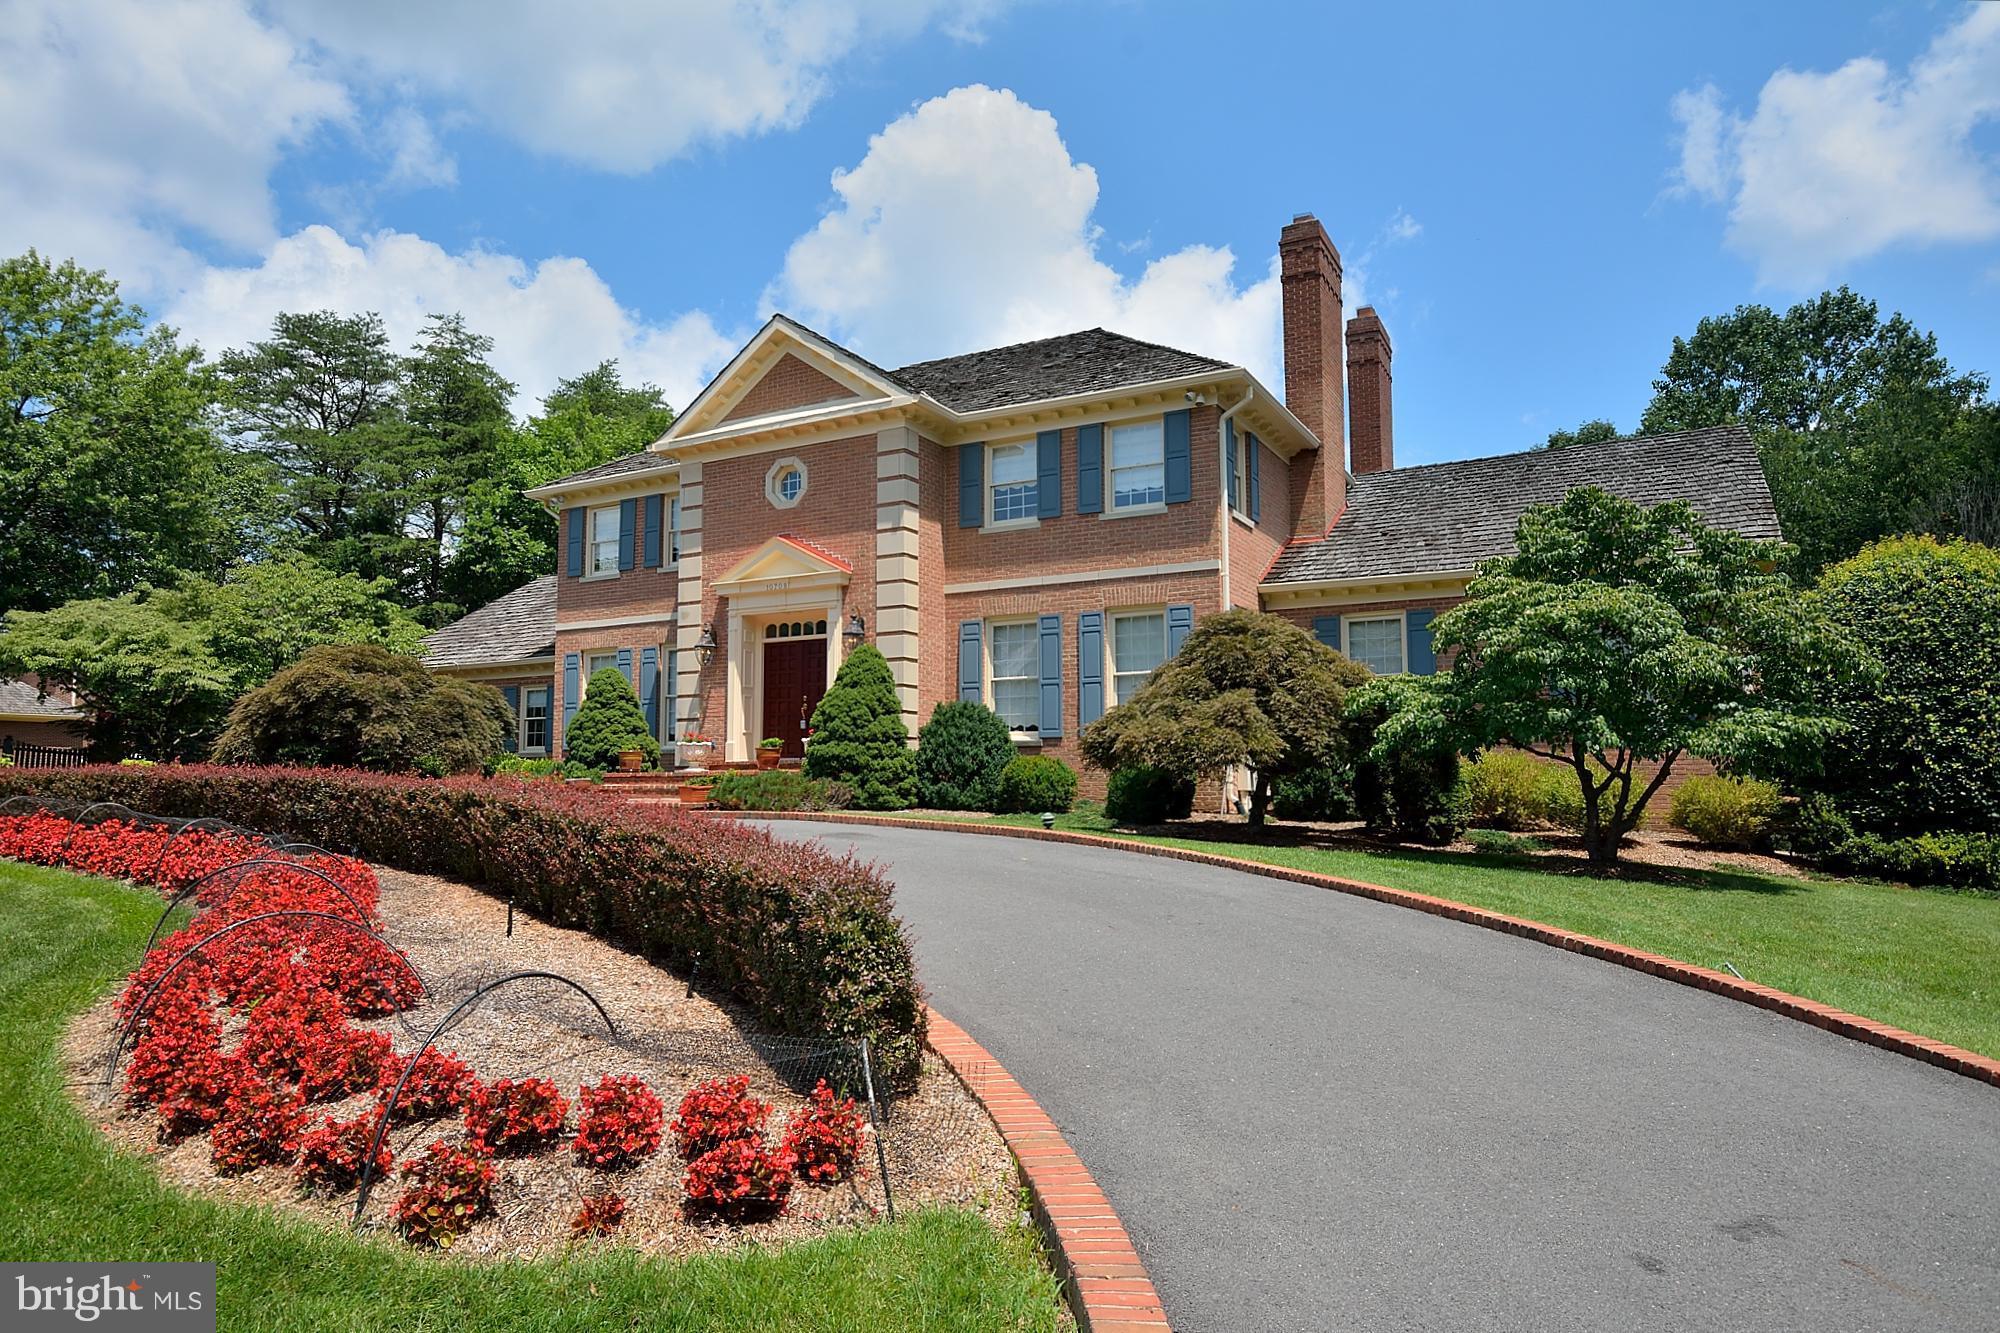 10709 Stapleford Hall Dr, Potomac, MD, 20854